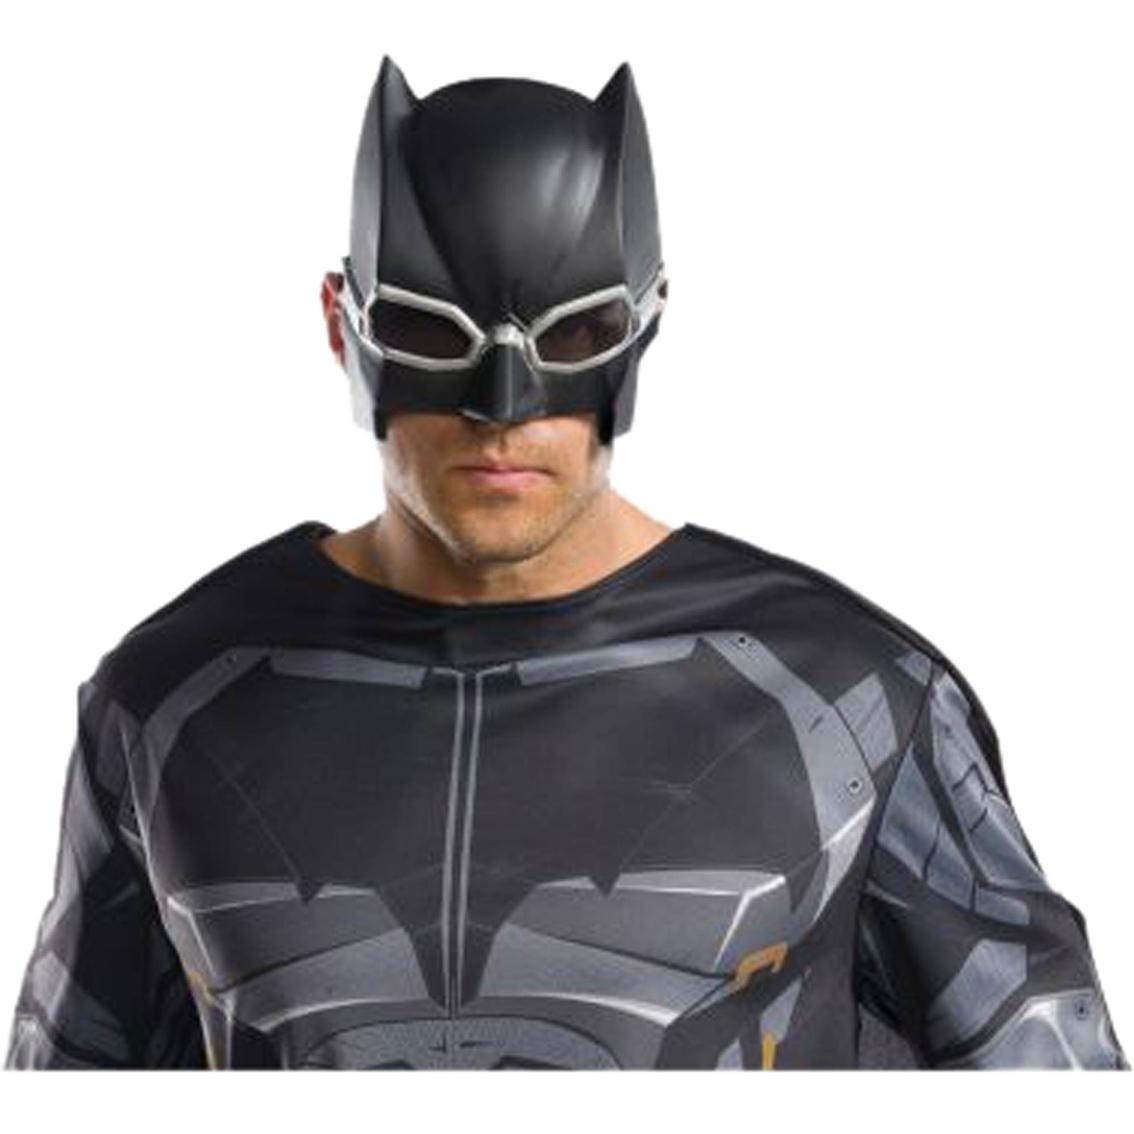 (AAFES/Military) Daily Special Batman, Jason, Deadpool, Freddie masks 50% off